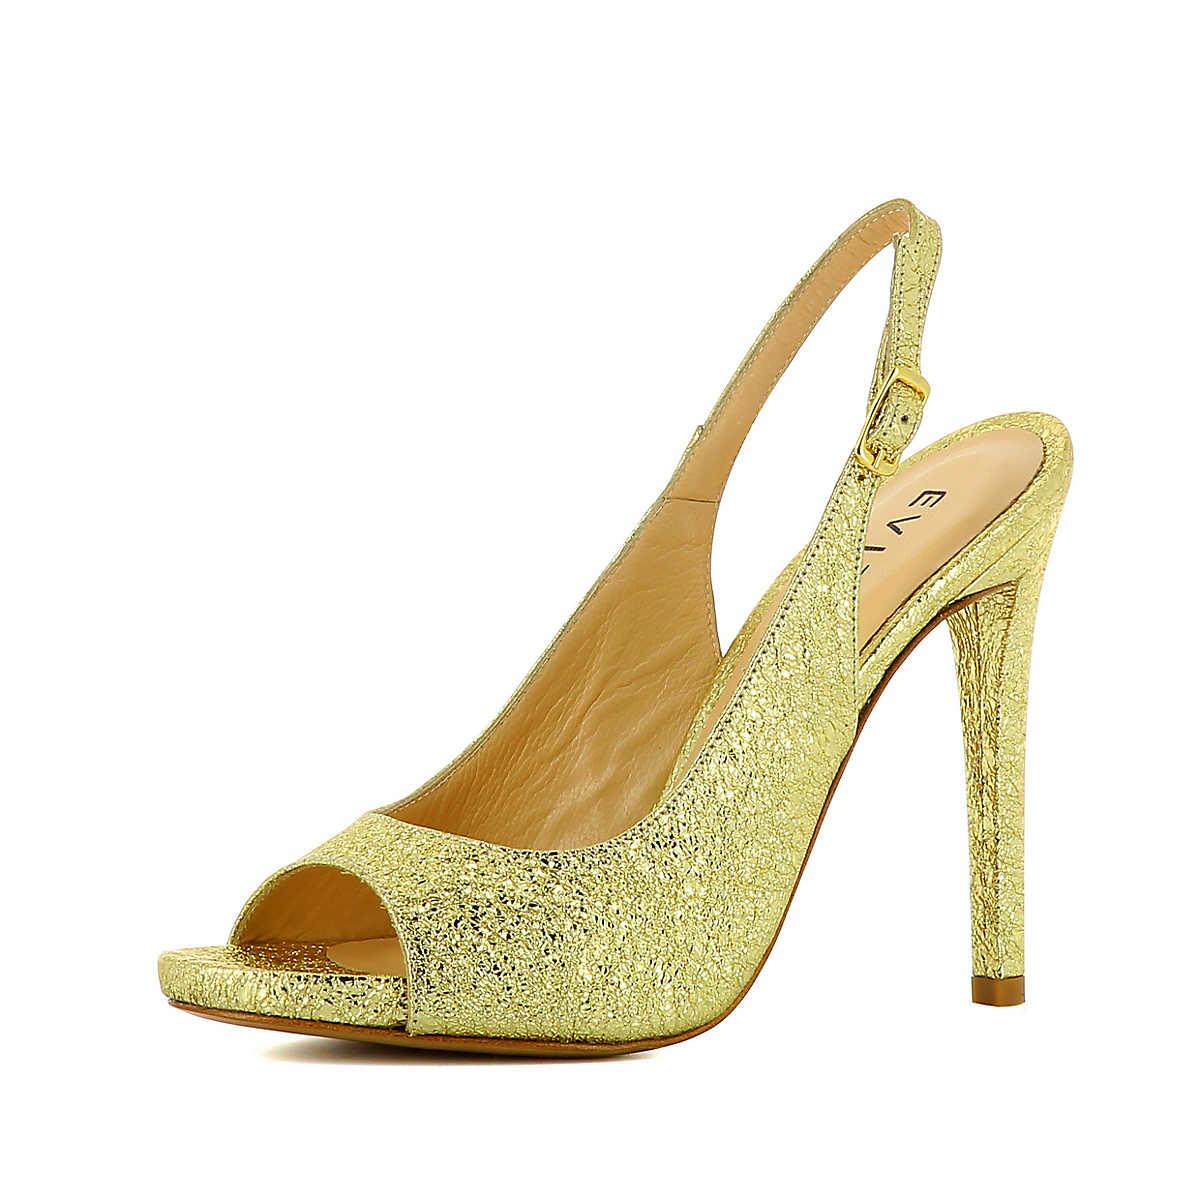 Evita Shoes Pumps gold - Evita Shoes - Pumps - Schuhe - mirapodo.de